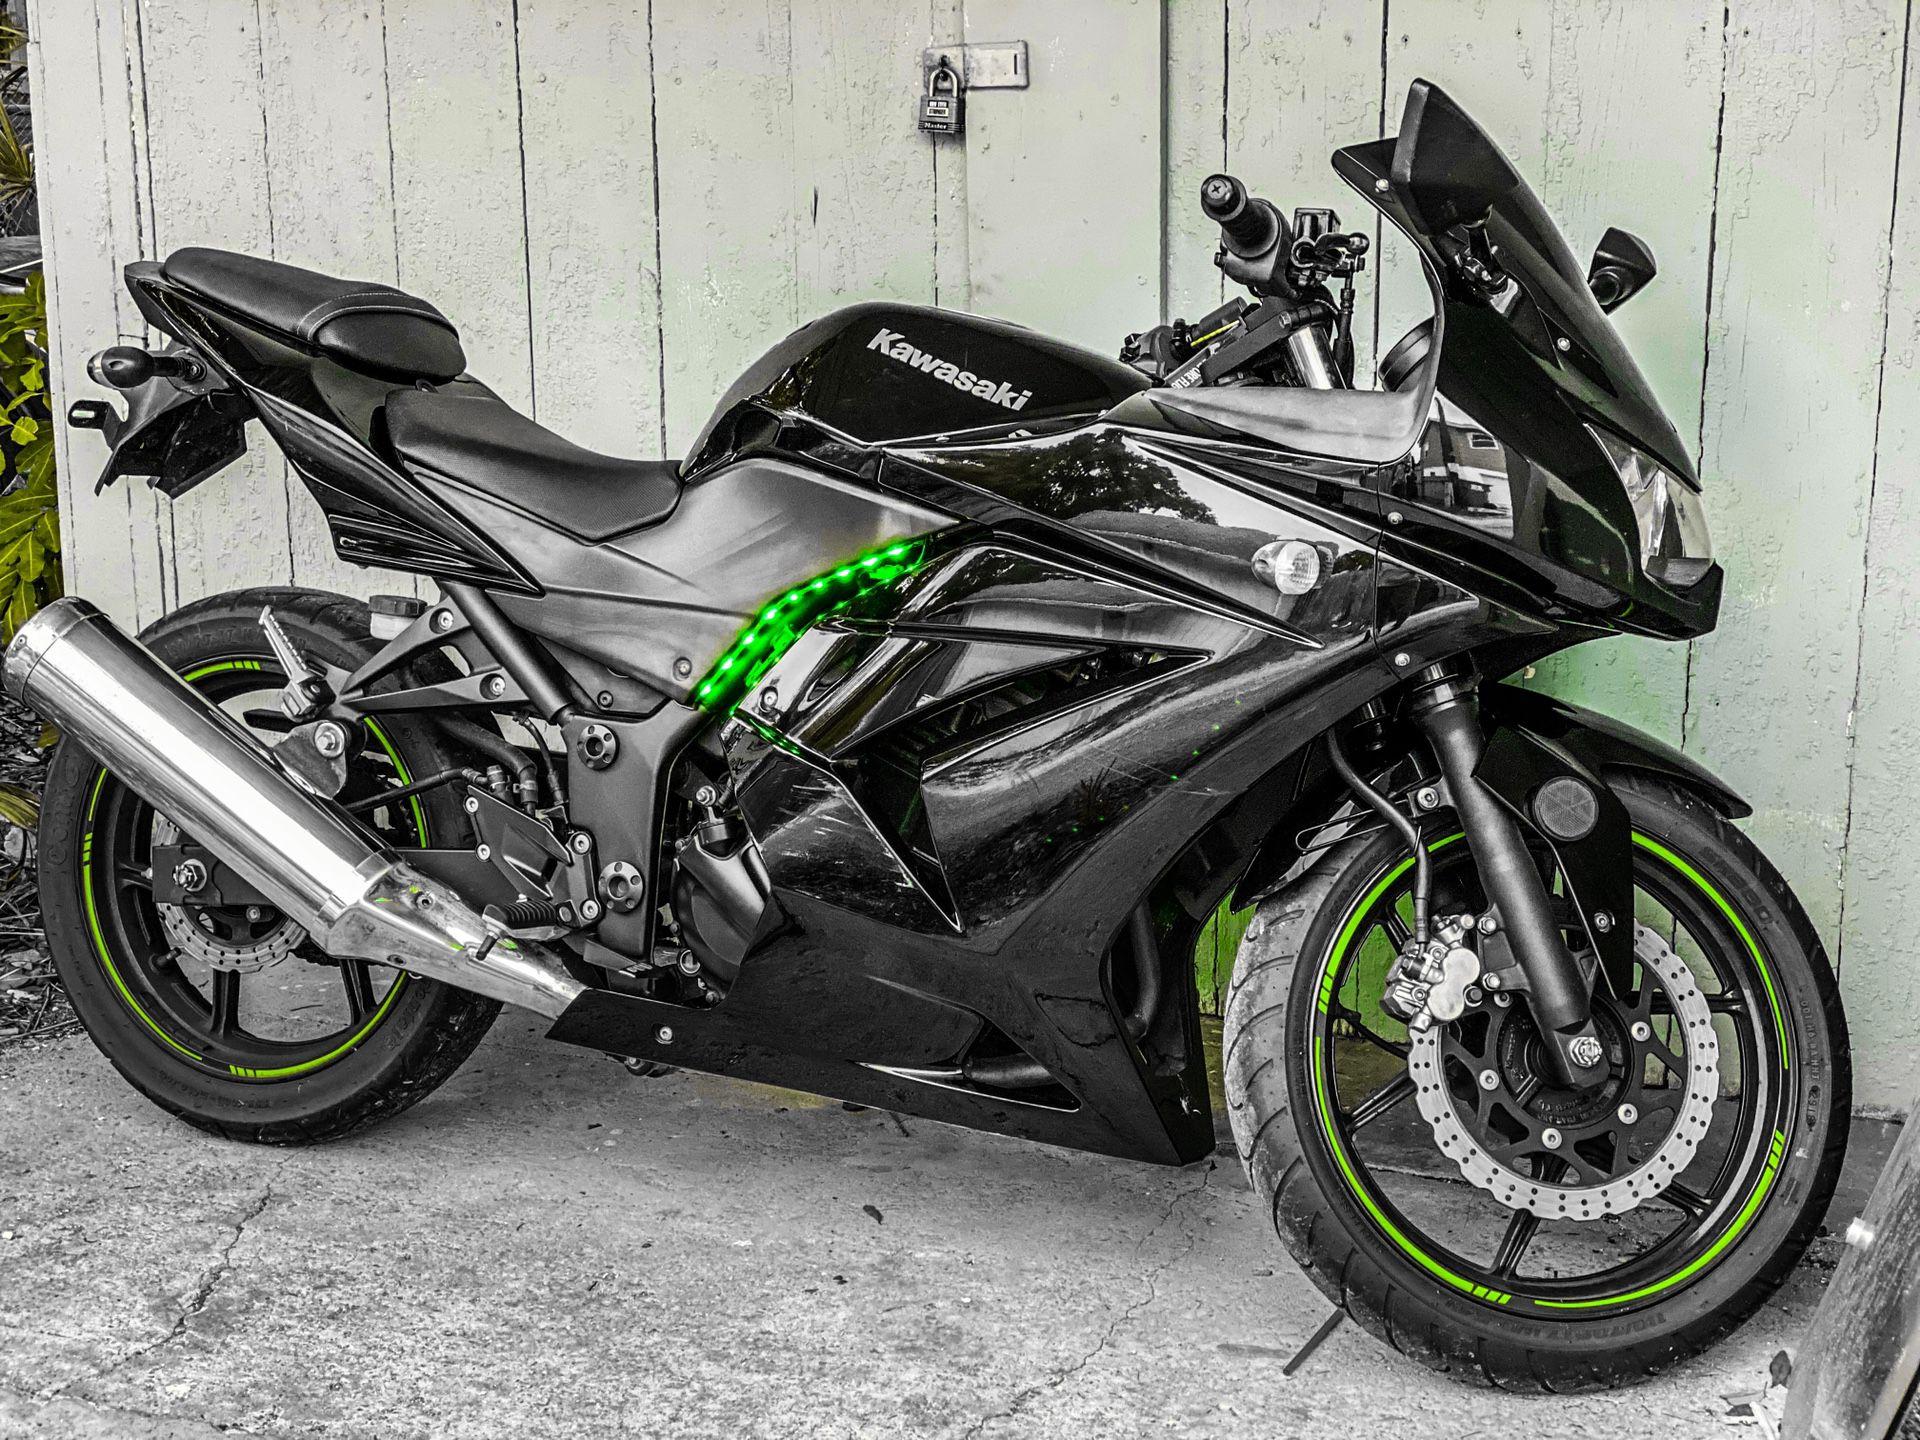 2009 Kawasaki Ninja 250-R